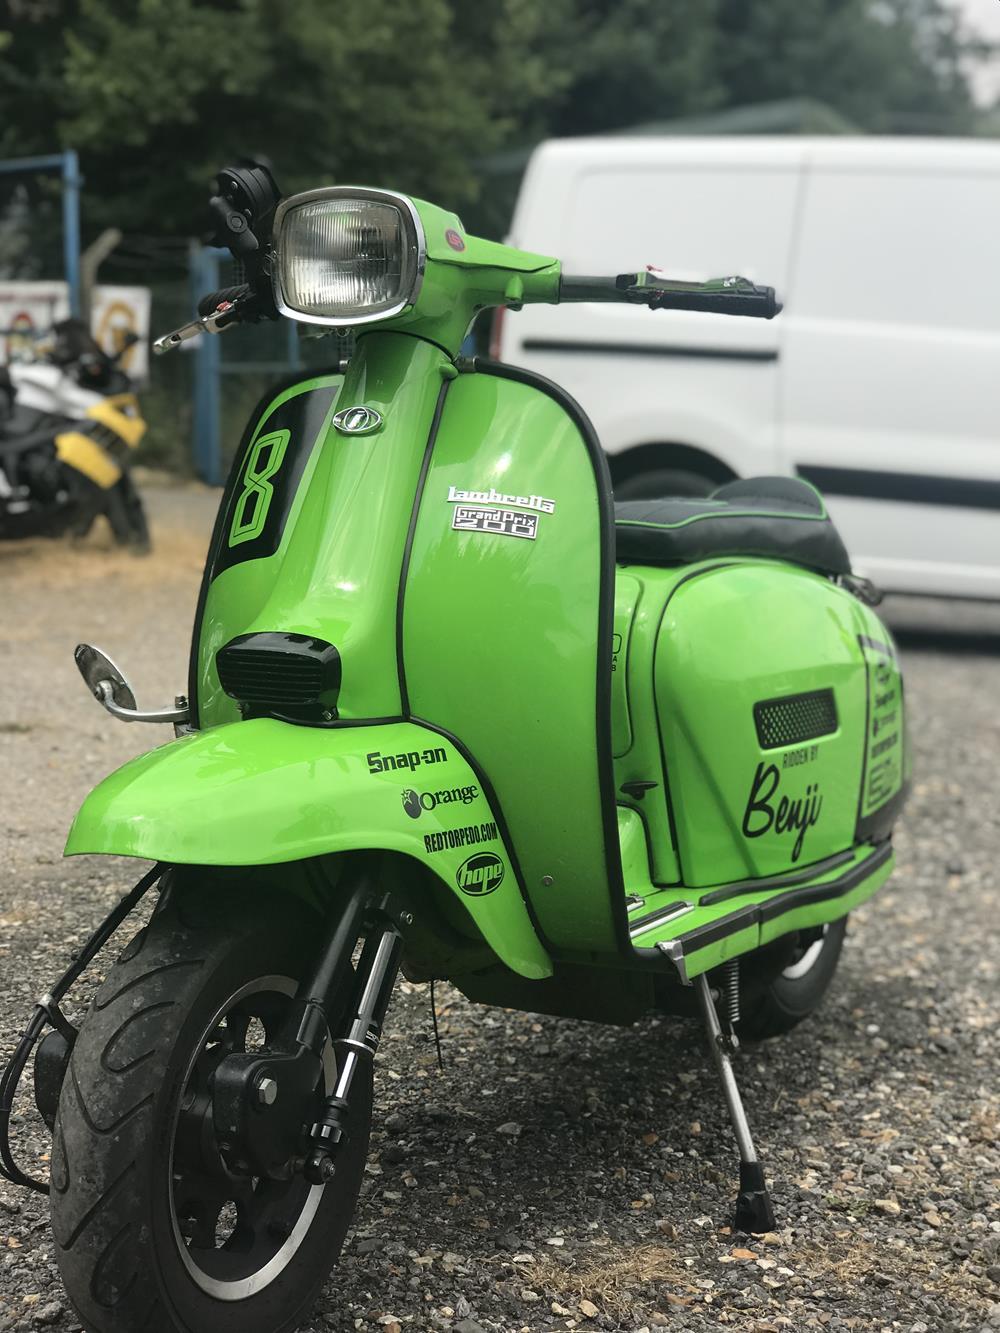 Green street-style Lambretta